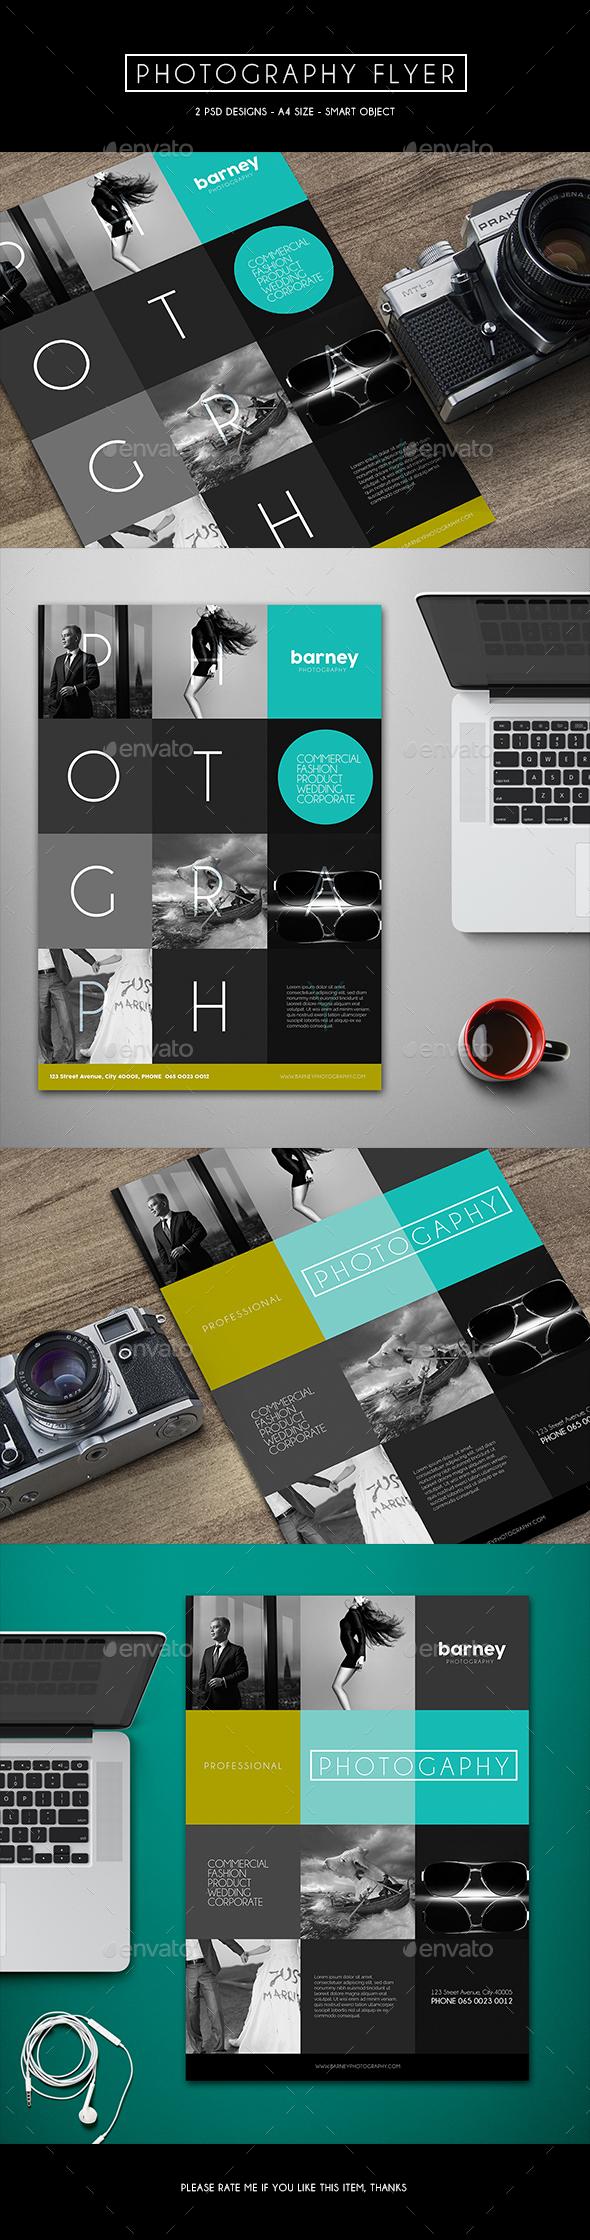 Photography Flyer - Commerce Flyers